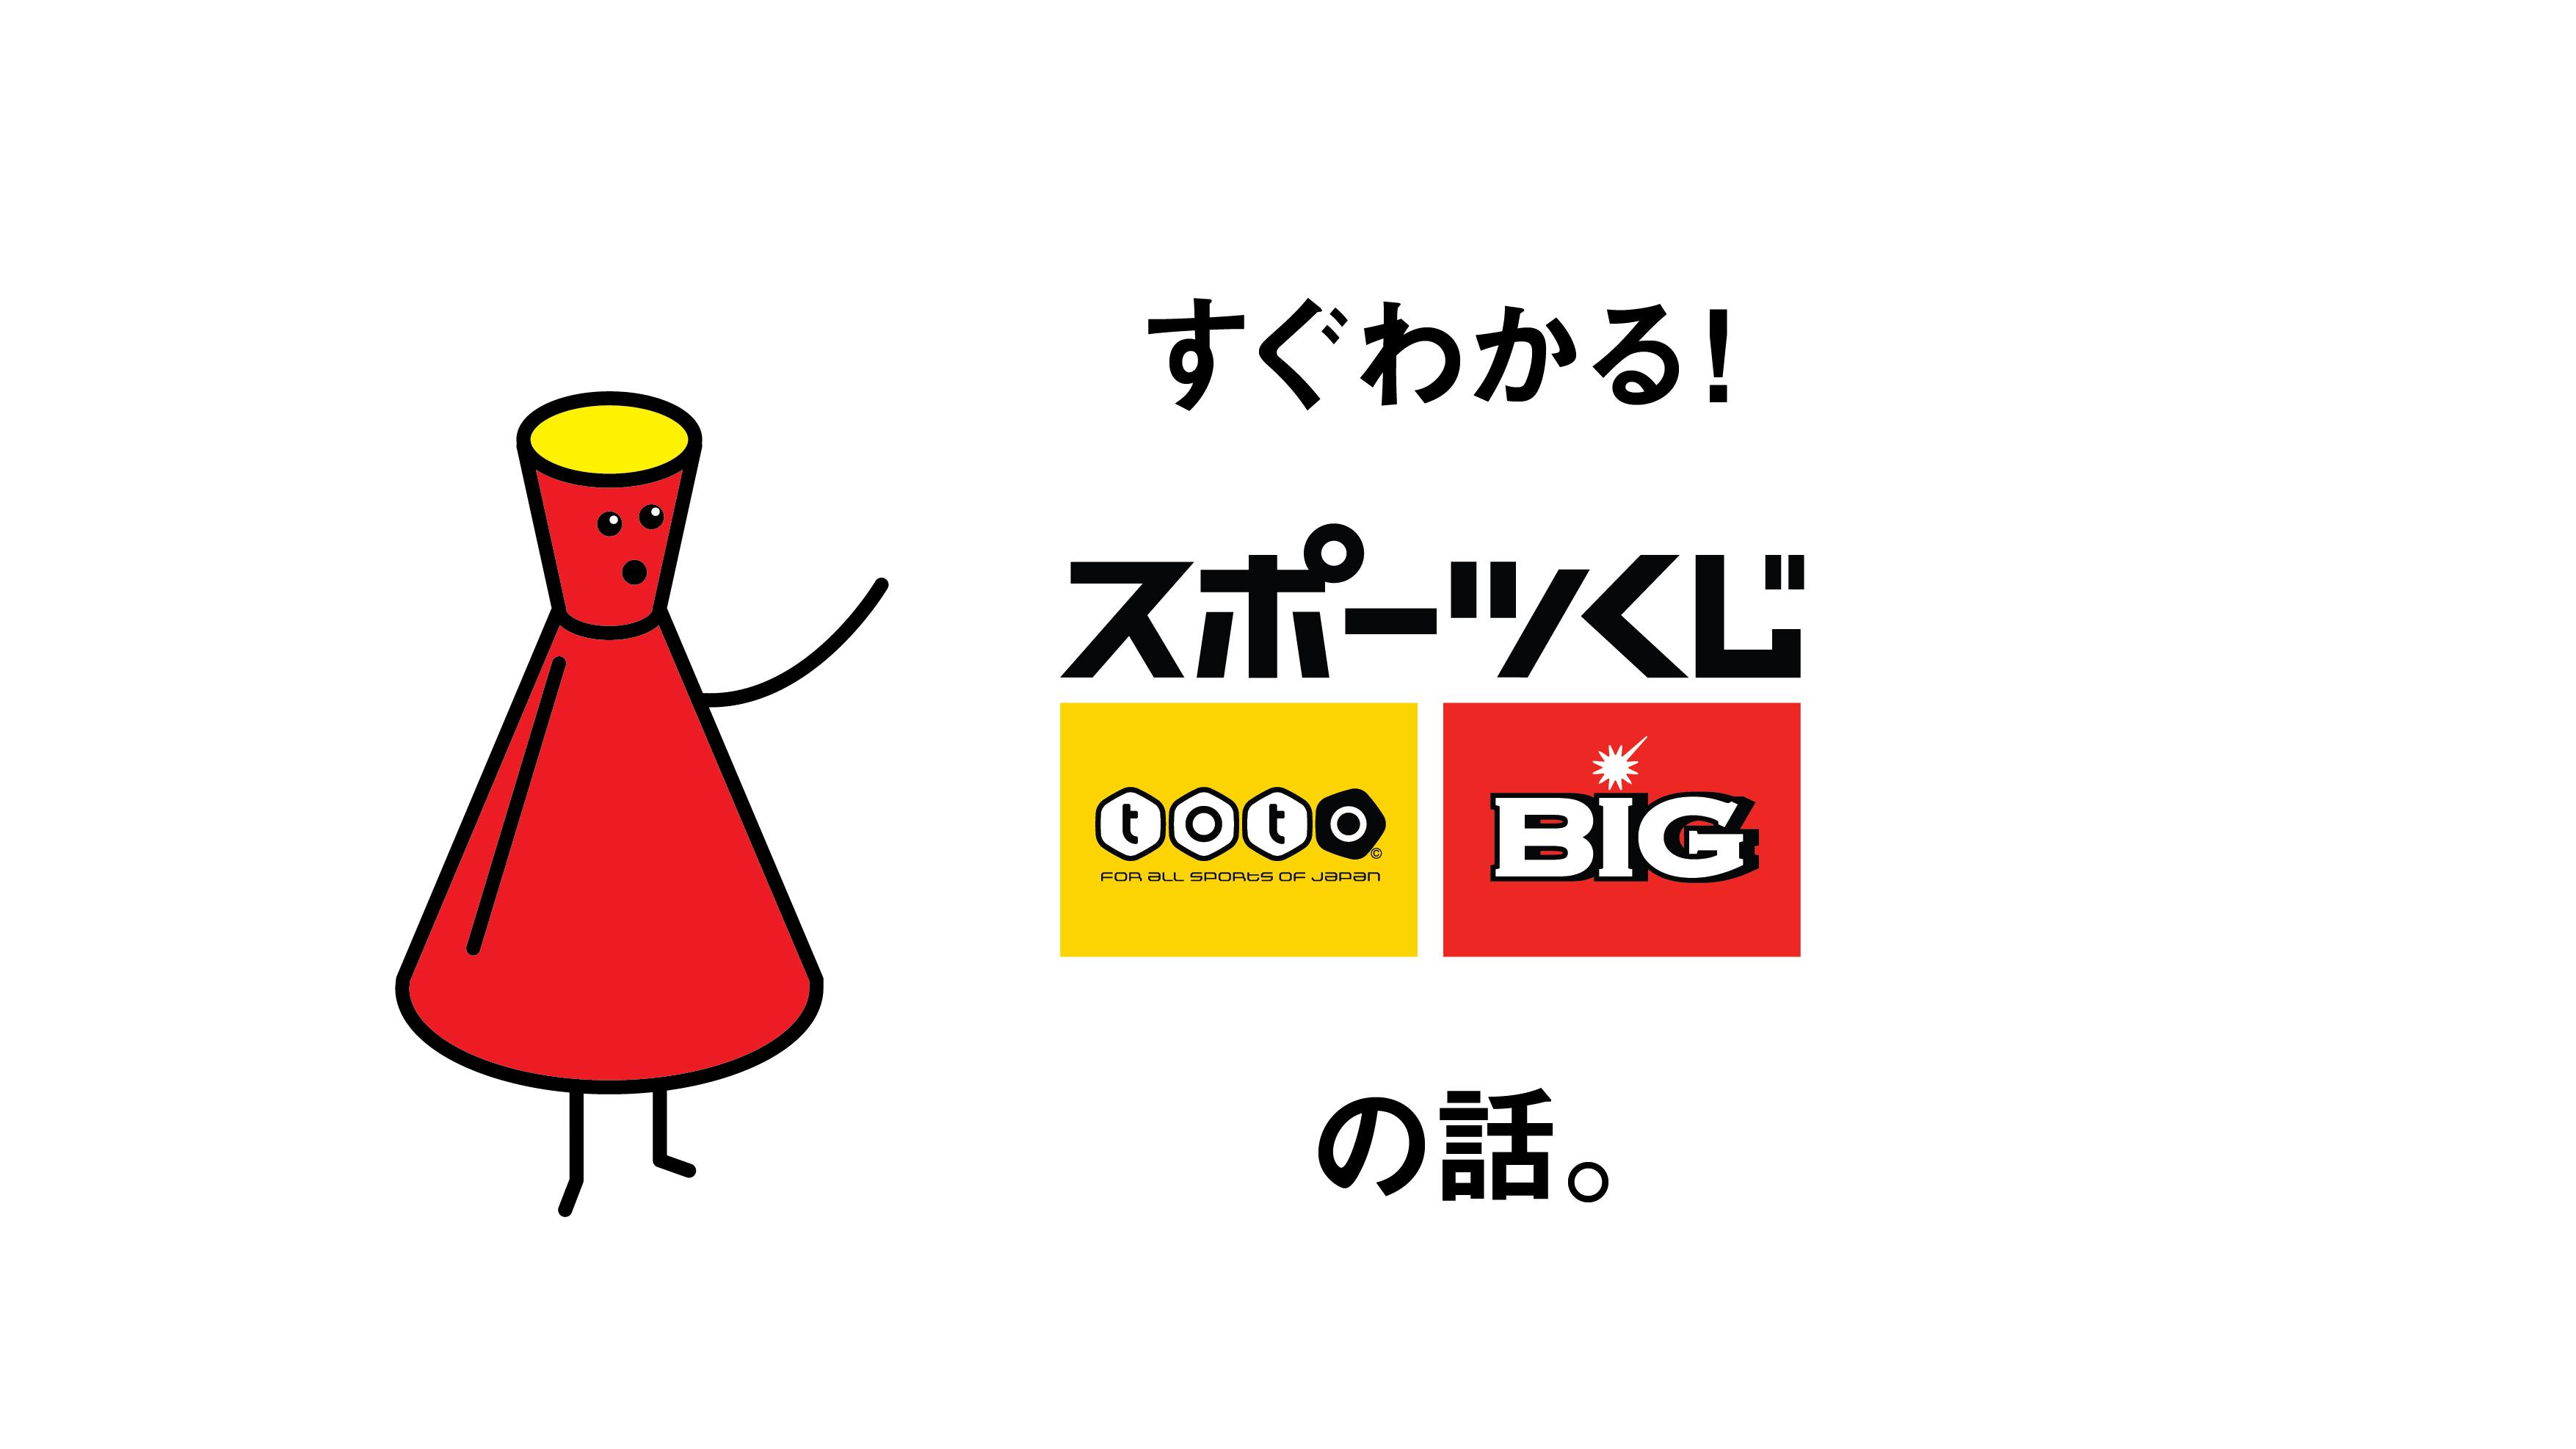 Big トト